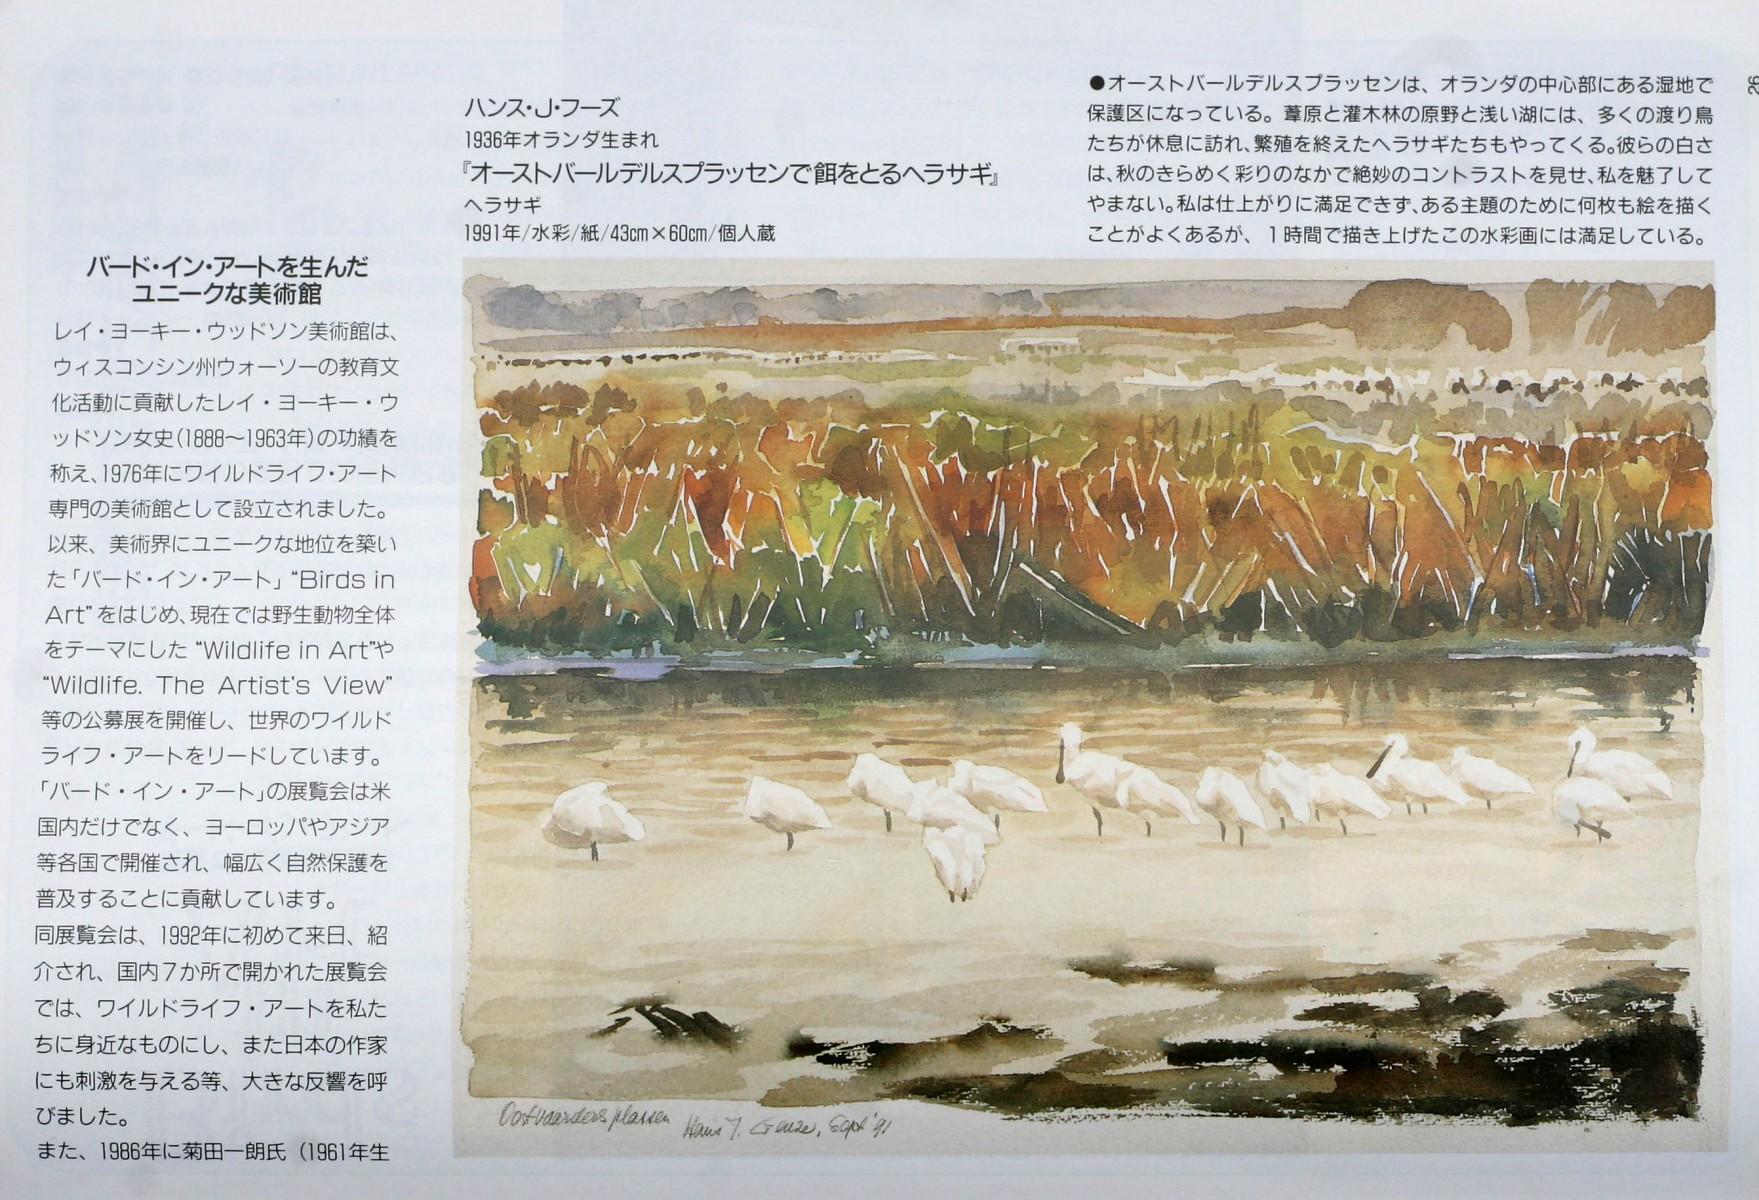 Wild-Birds-Nikon-1994